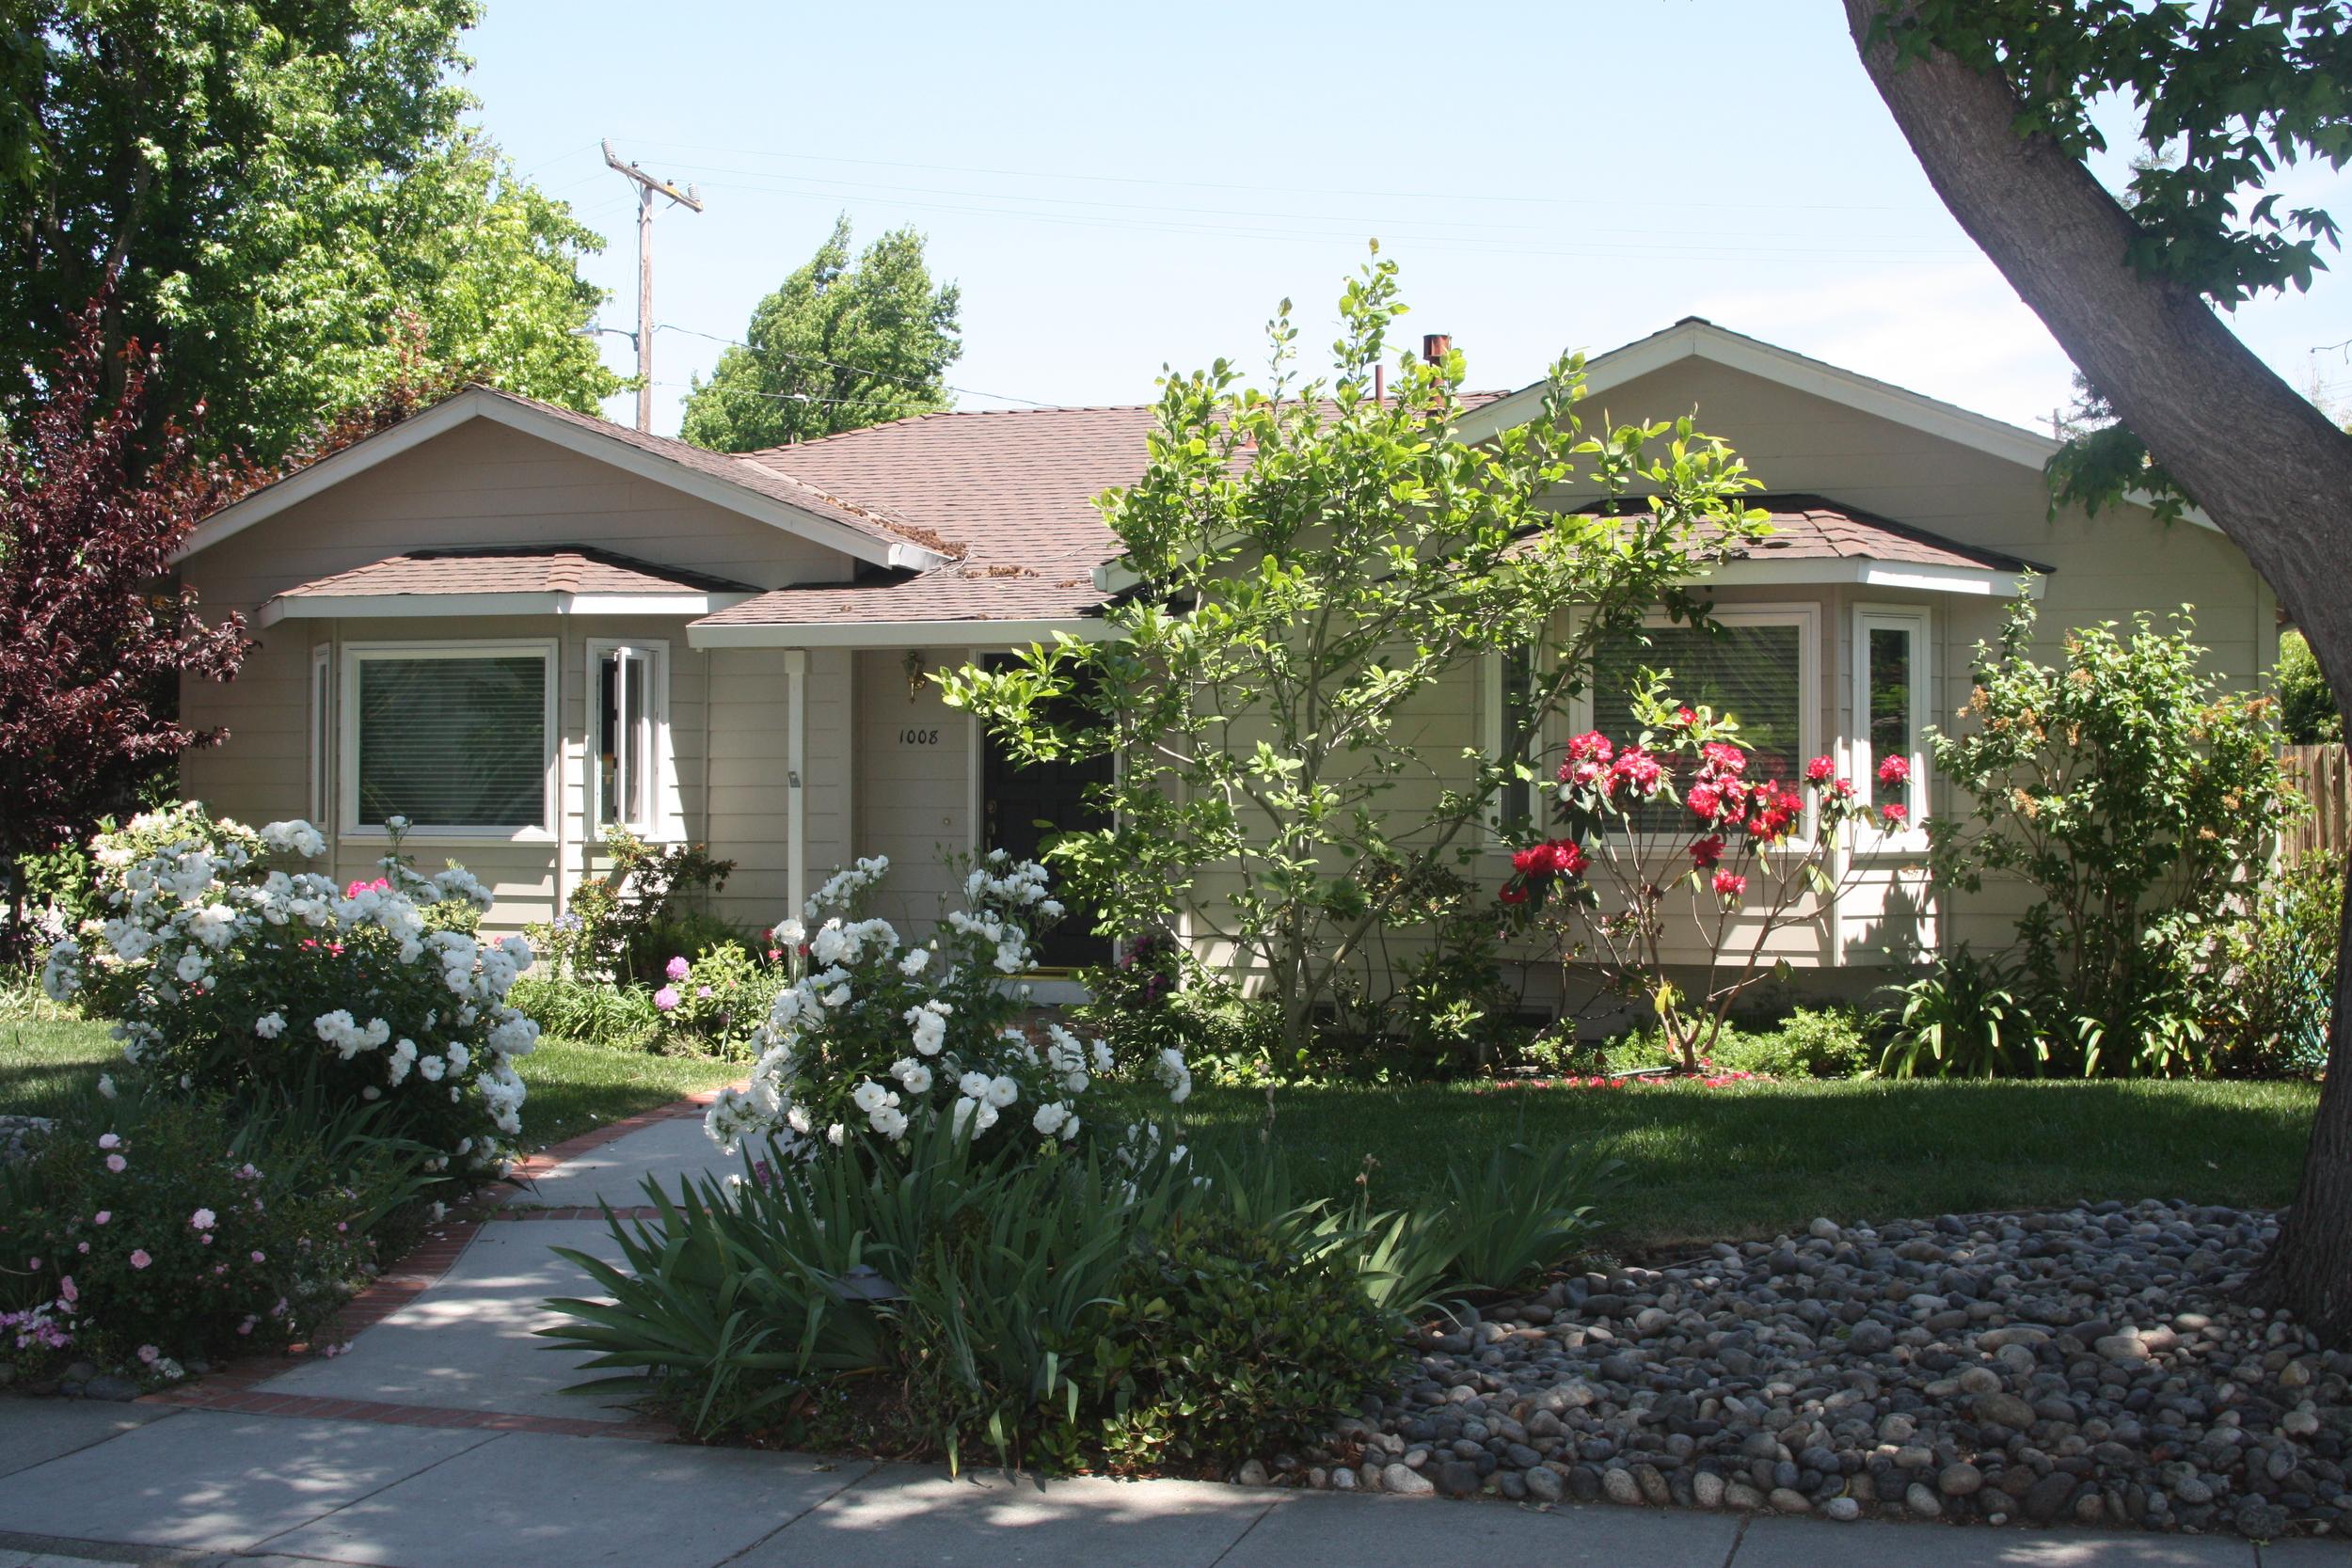 SOLD:  1008 Greenwood Dr, Menlo Park  Mature landscaping, delightful neighborhood  Offered at $1,275,000